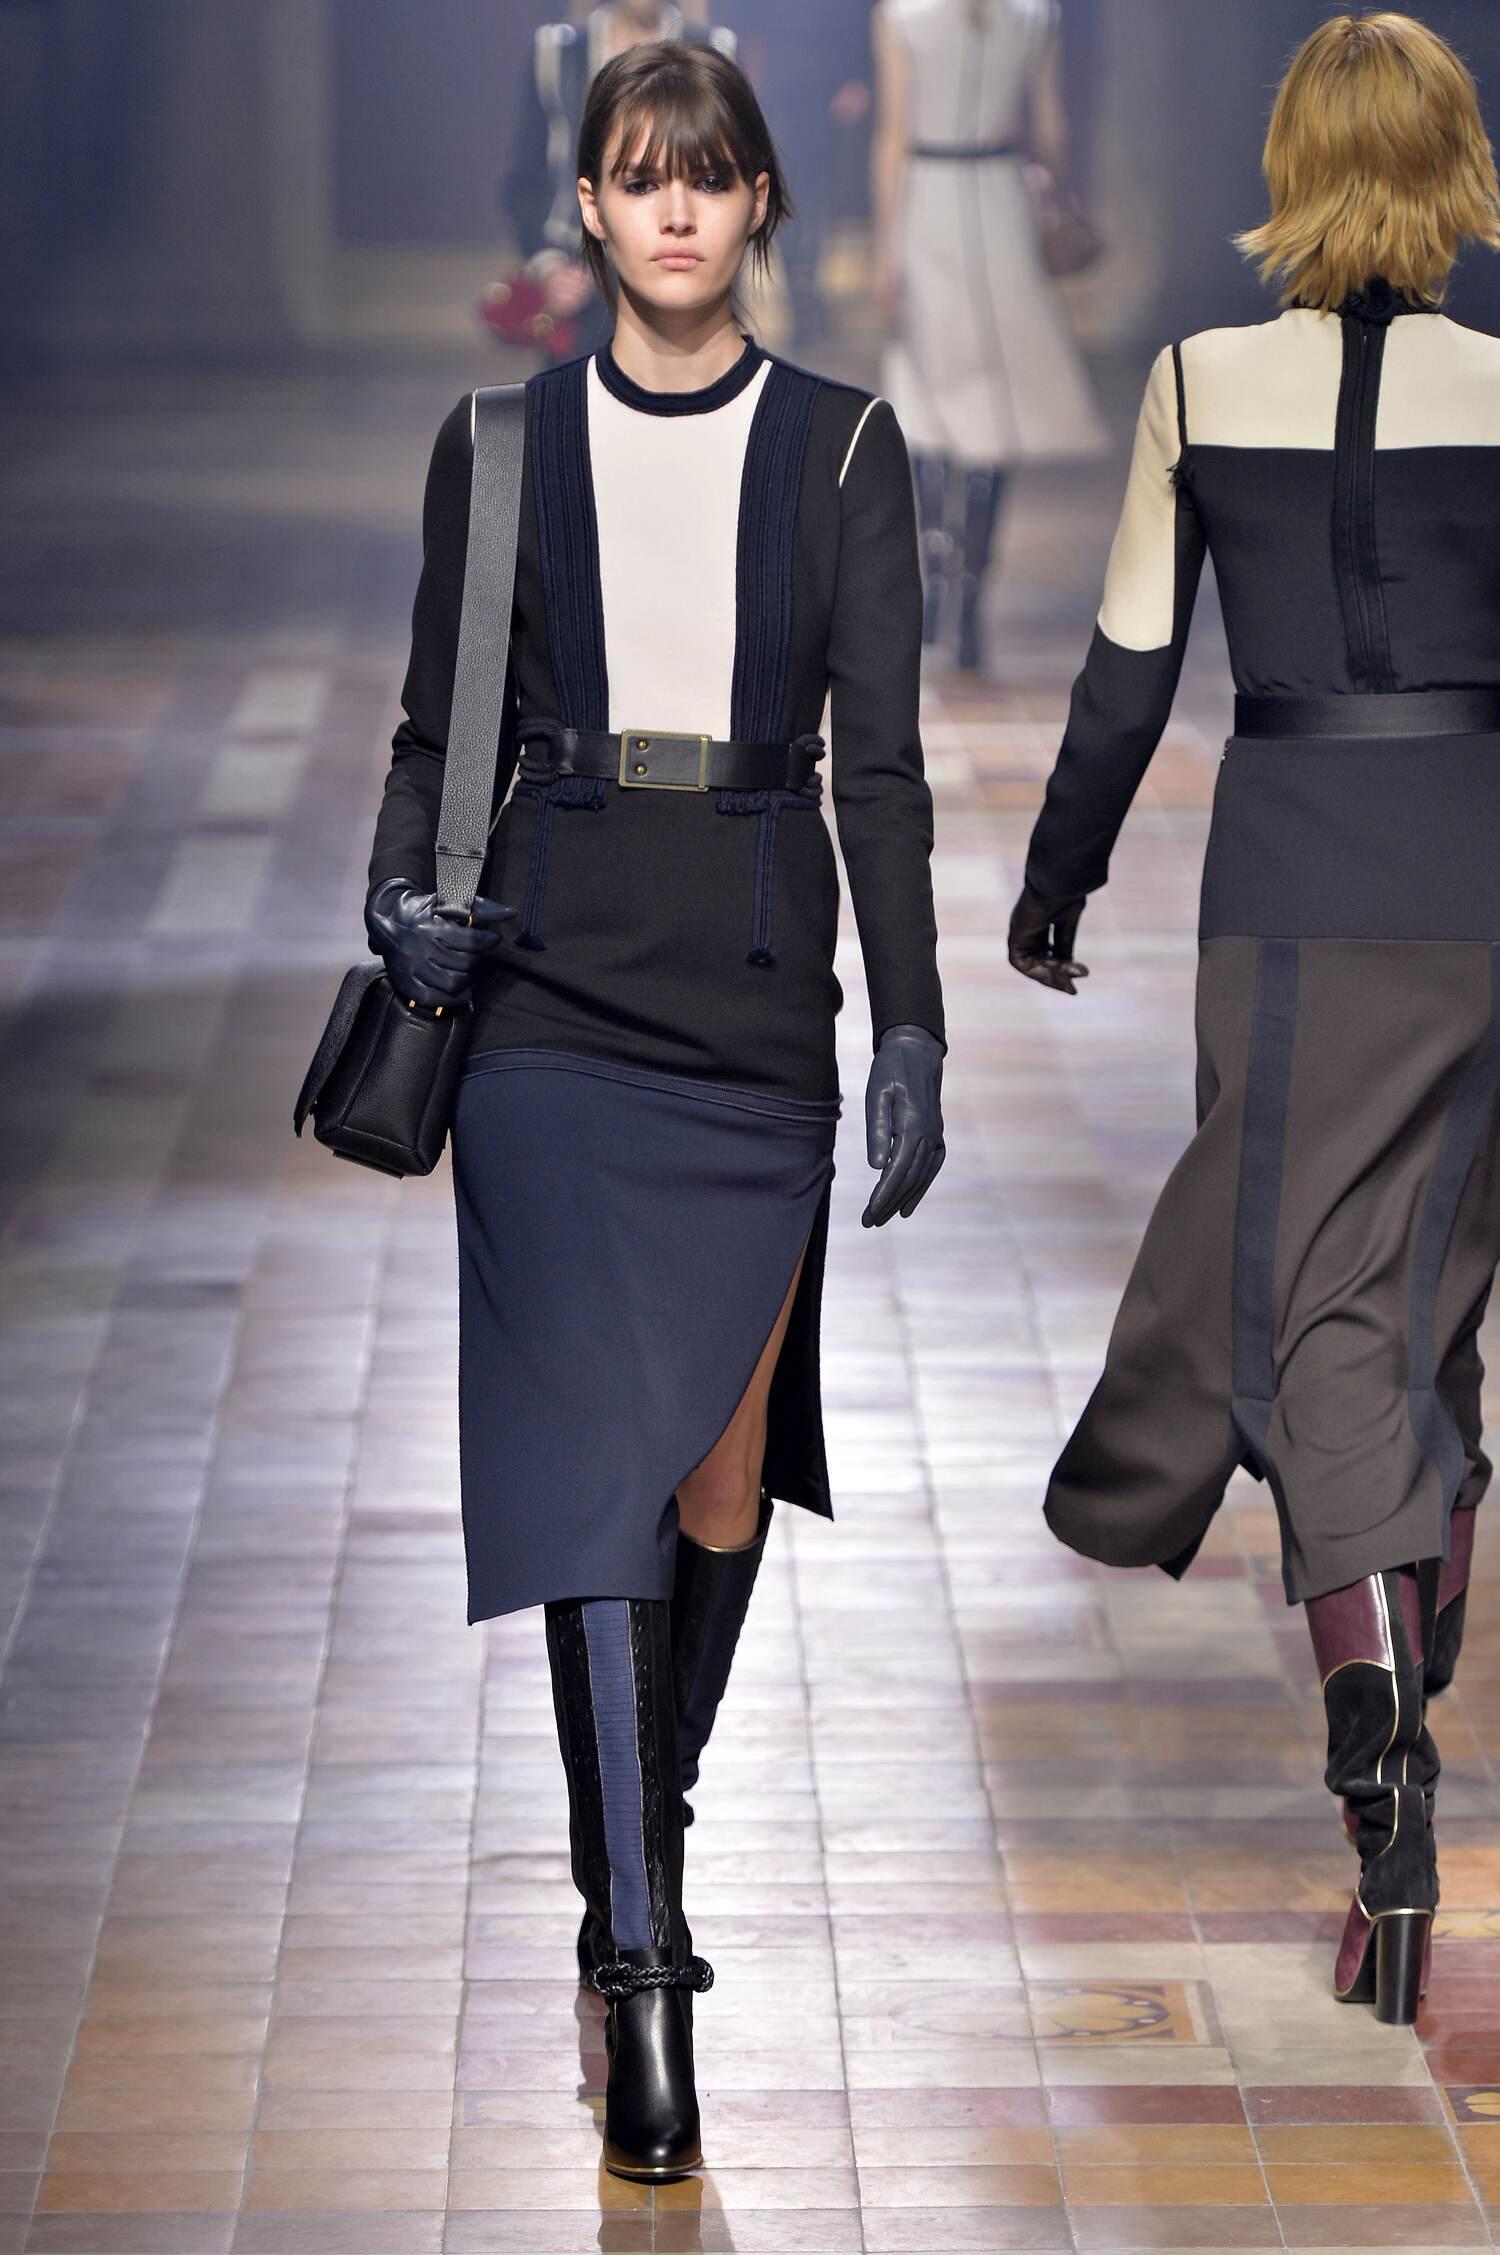 Fall Winter 2015 16 Fashion Collection Lanvin